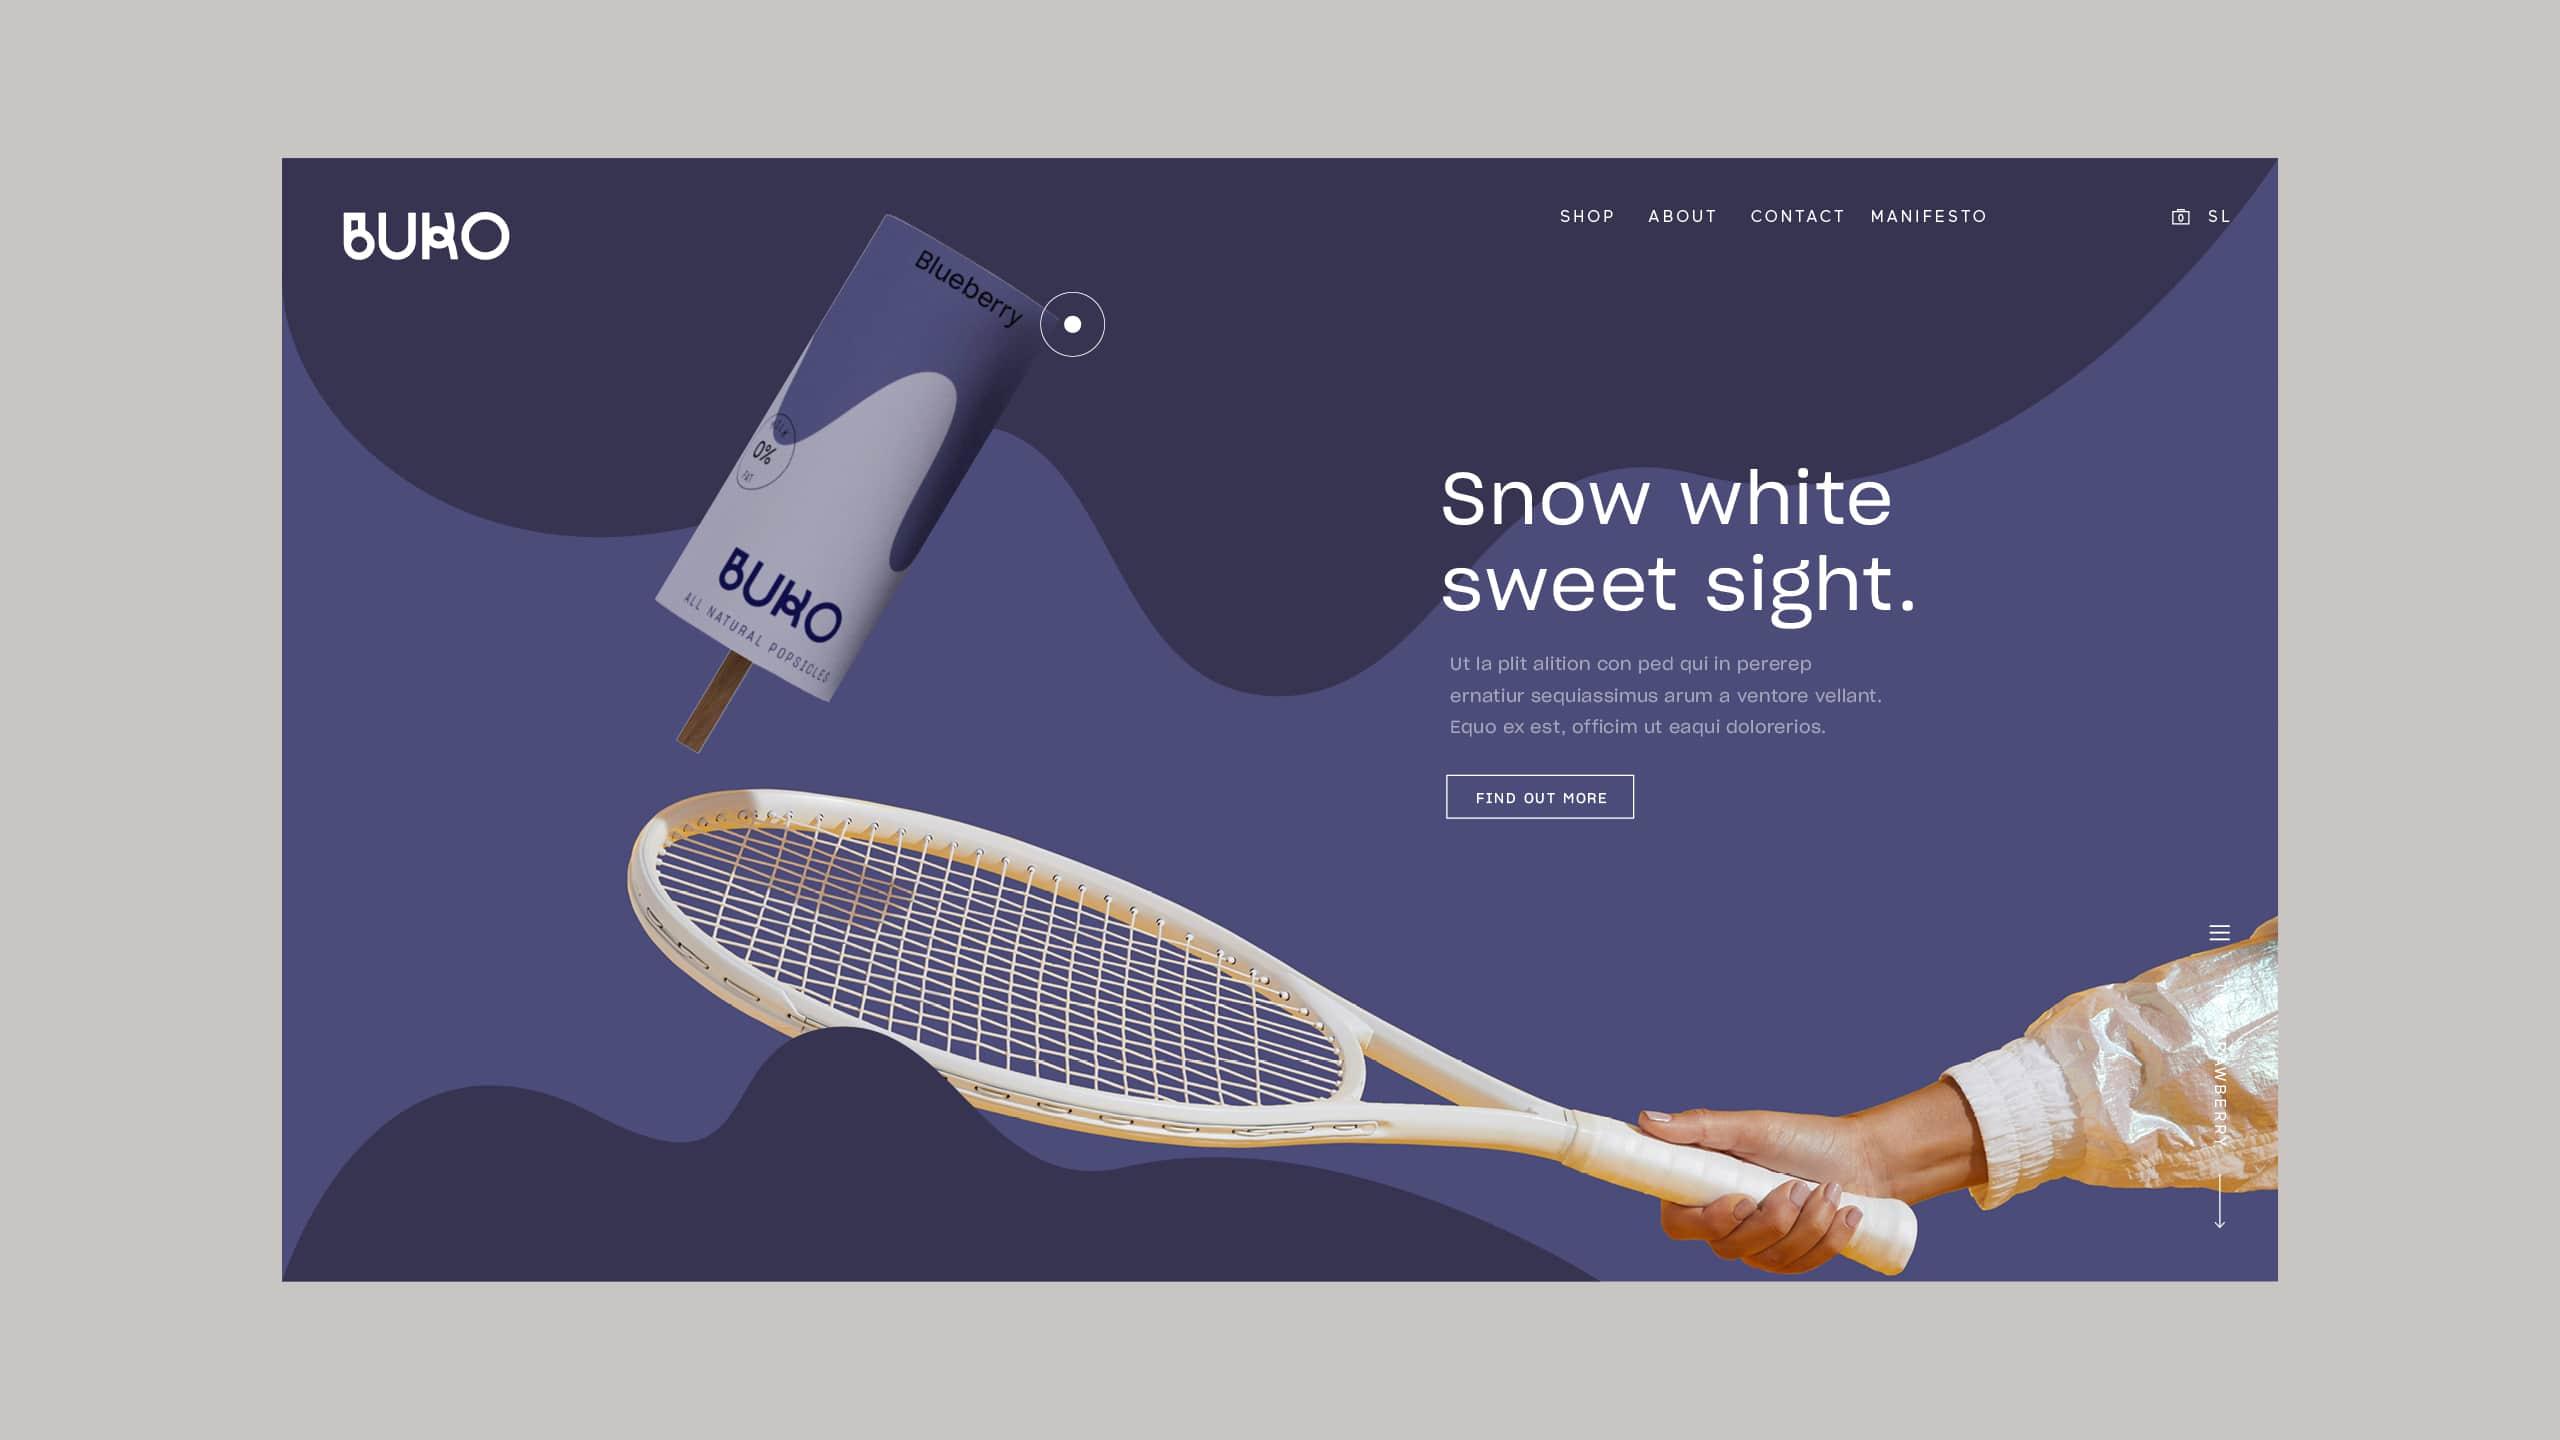 mantik-digital-creative-agency-branding-popsicle-icecream-packaging-experience-web-design-development19-min